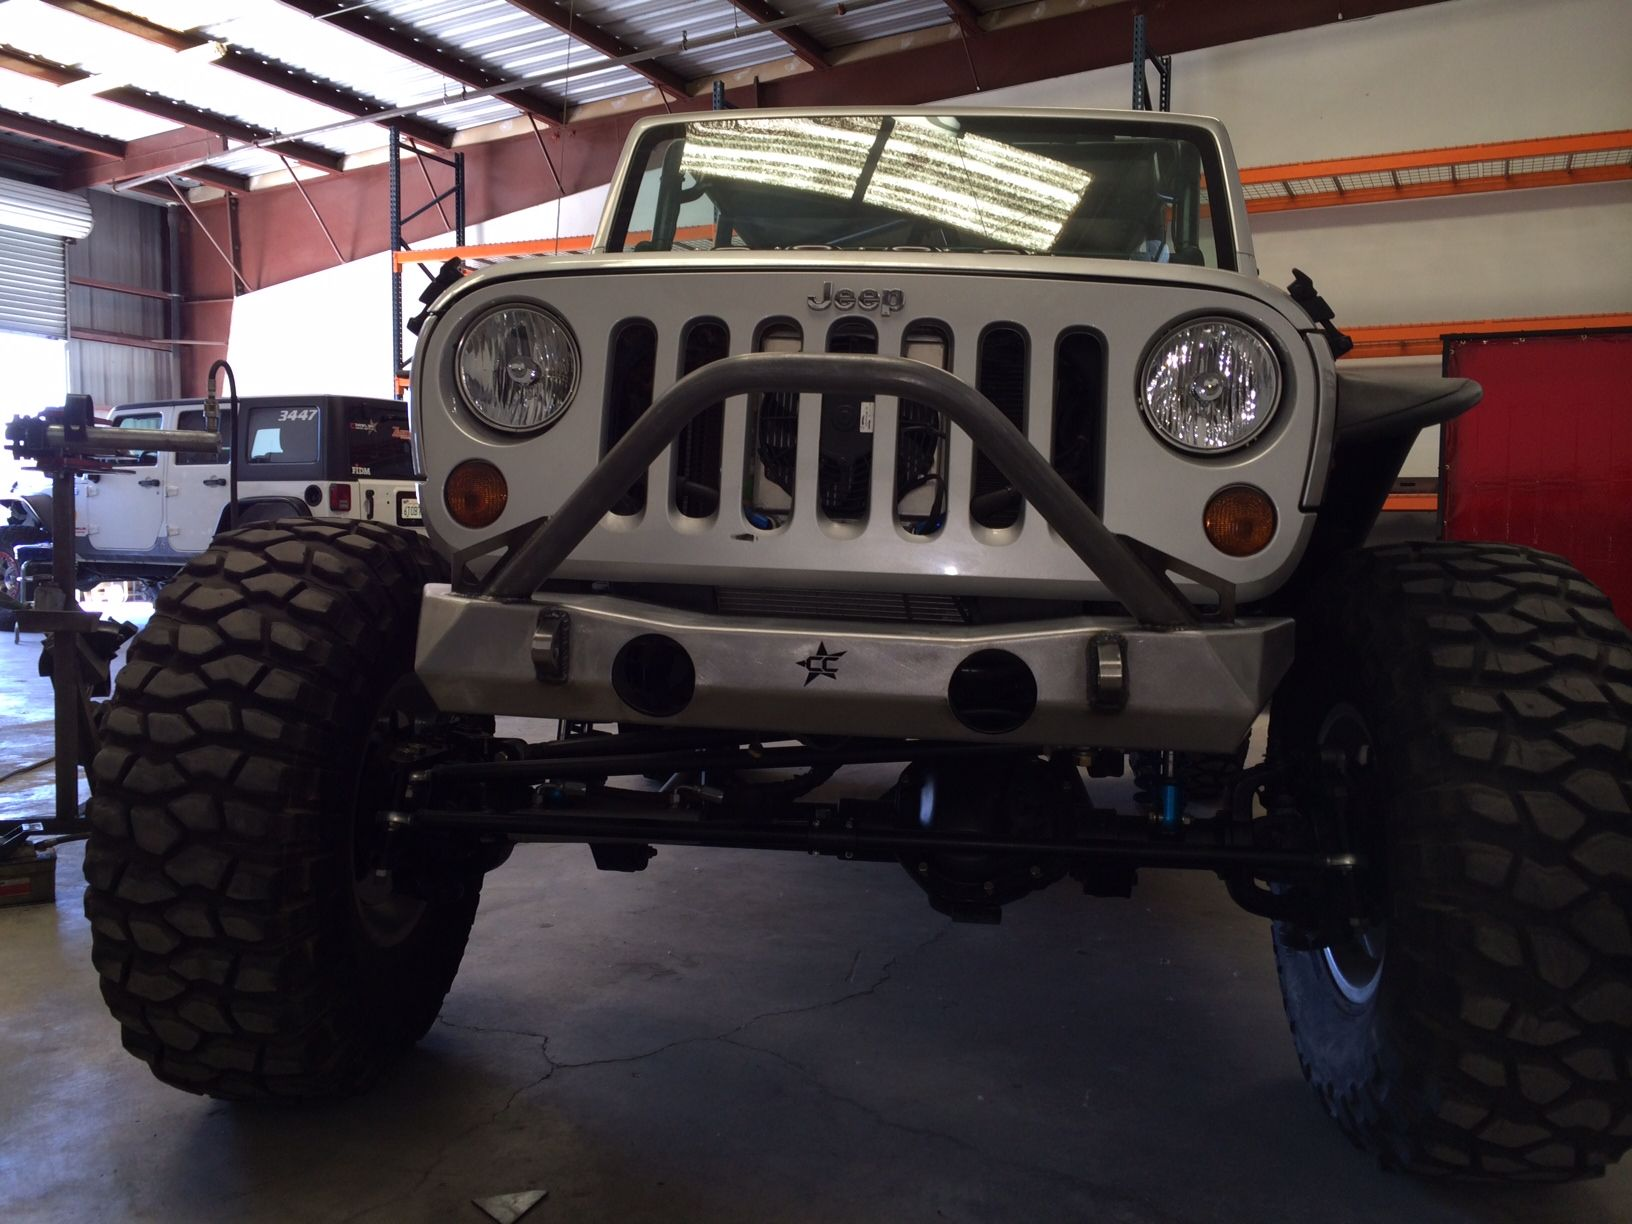 RK 3.5 lift pics please - Page 2 - JKowners.com : Jeep